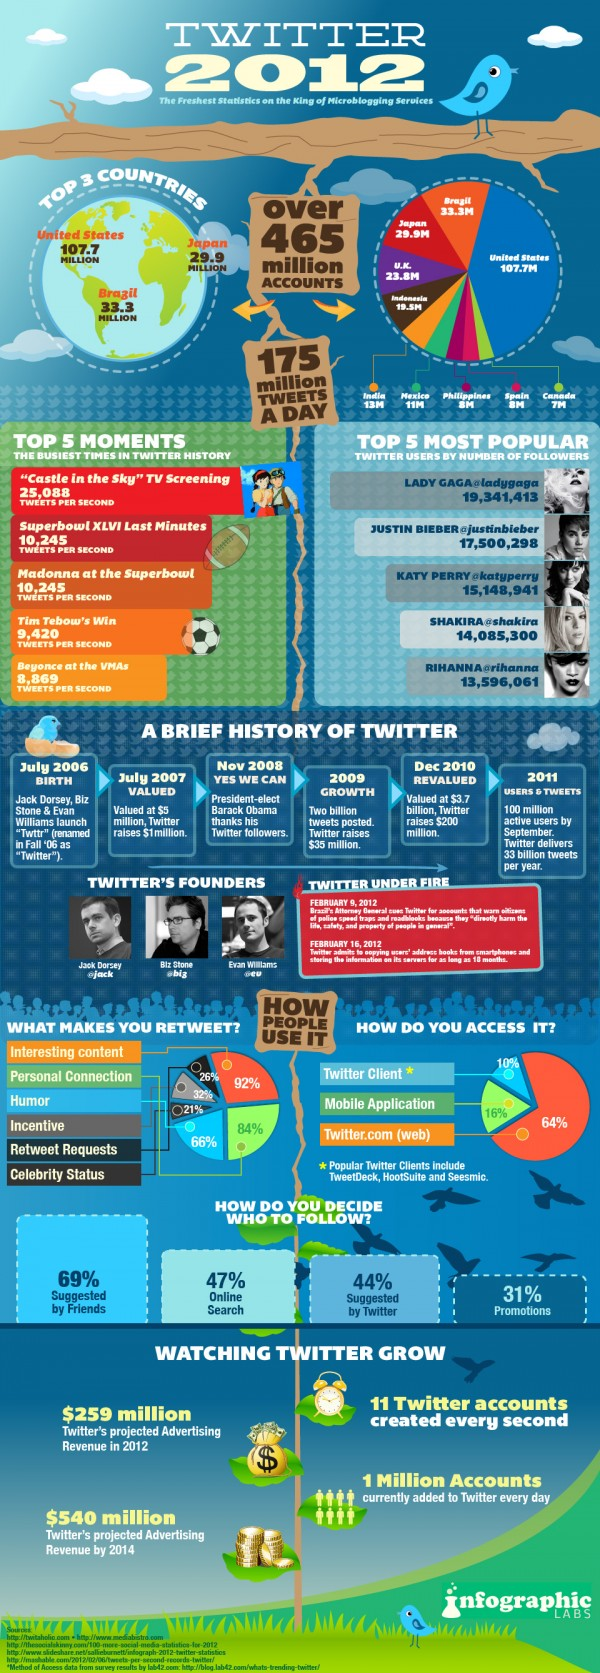 Twitter stats 2012